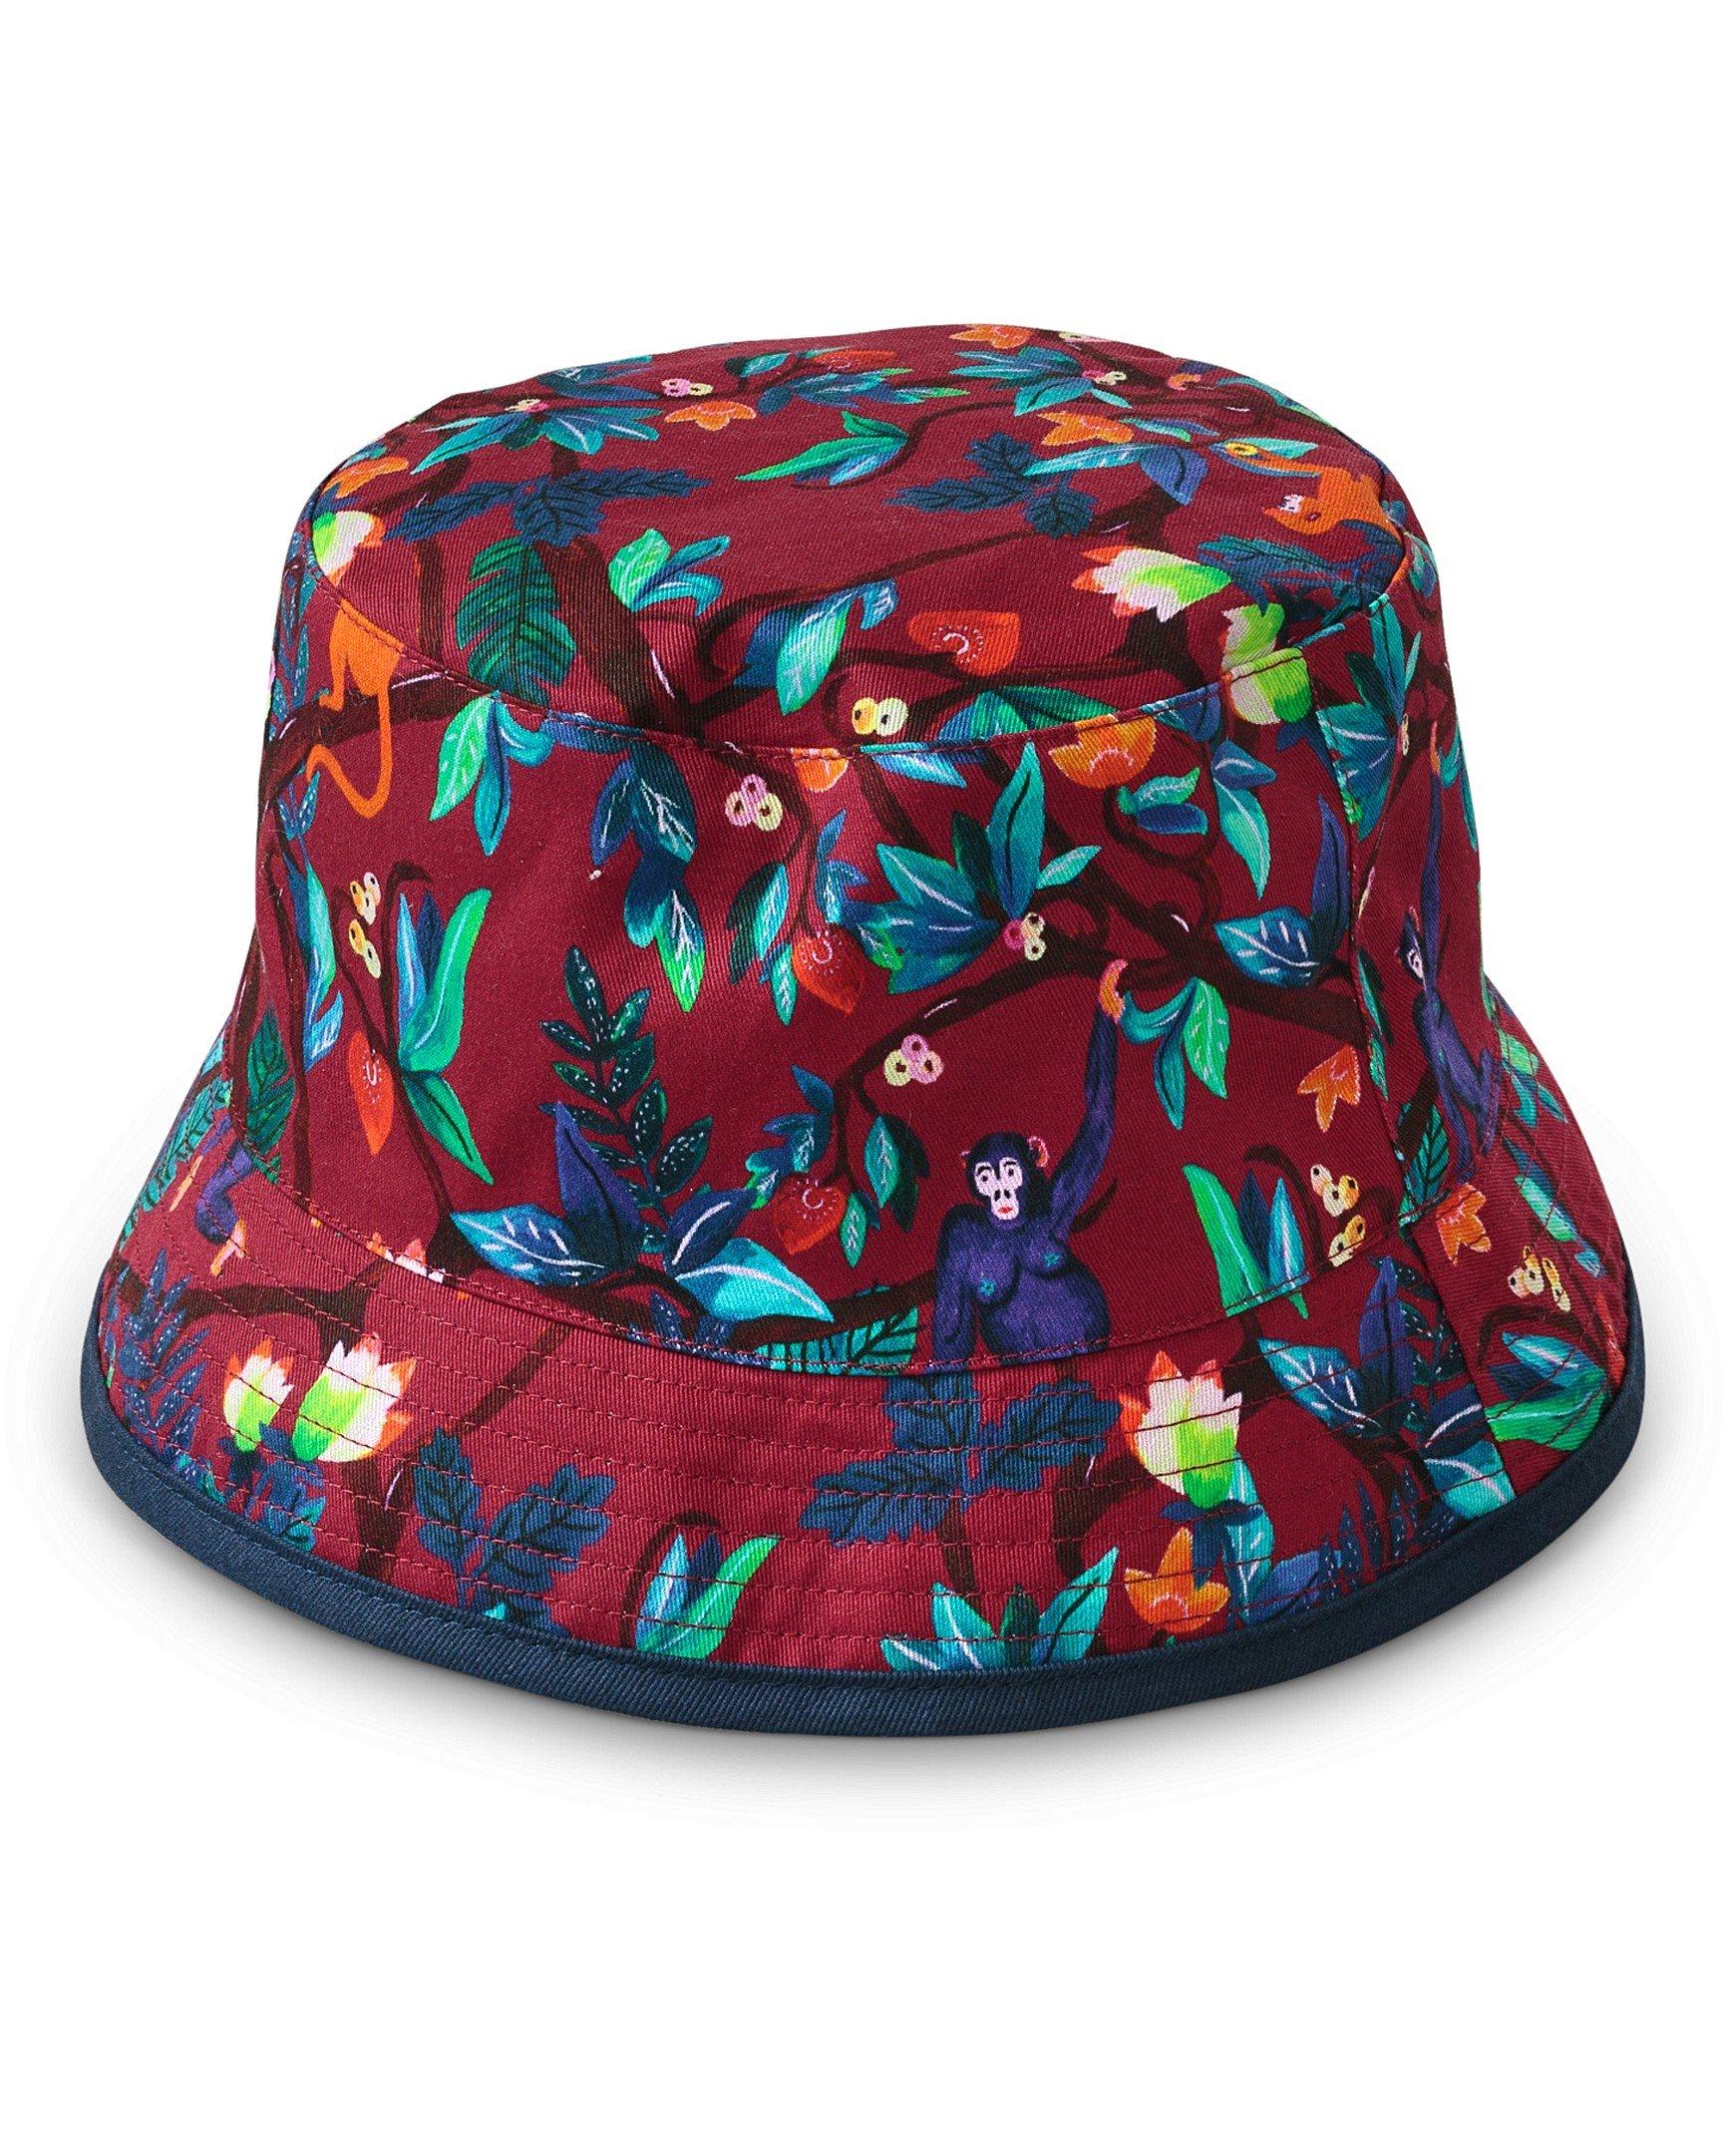 4f7dab06 Monkey Reversible Bucket Hat